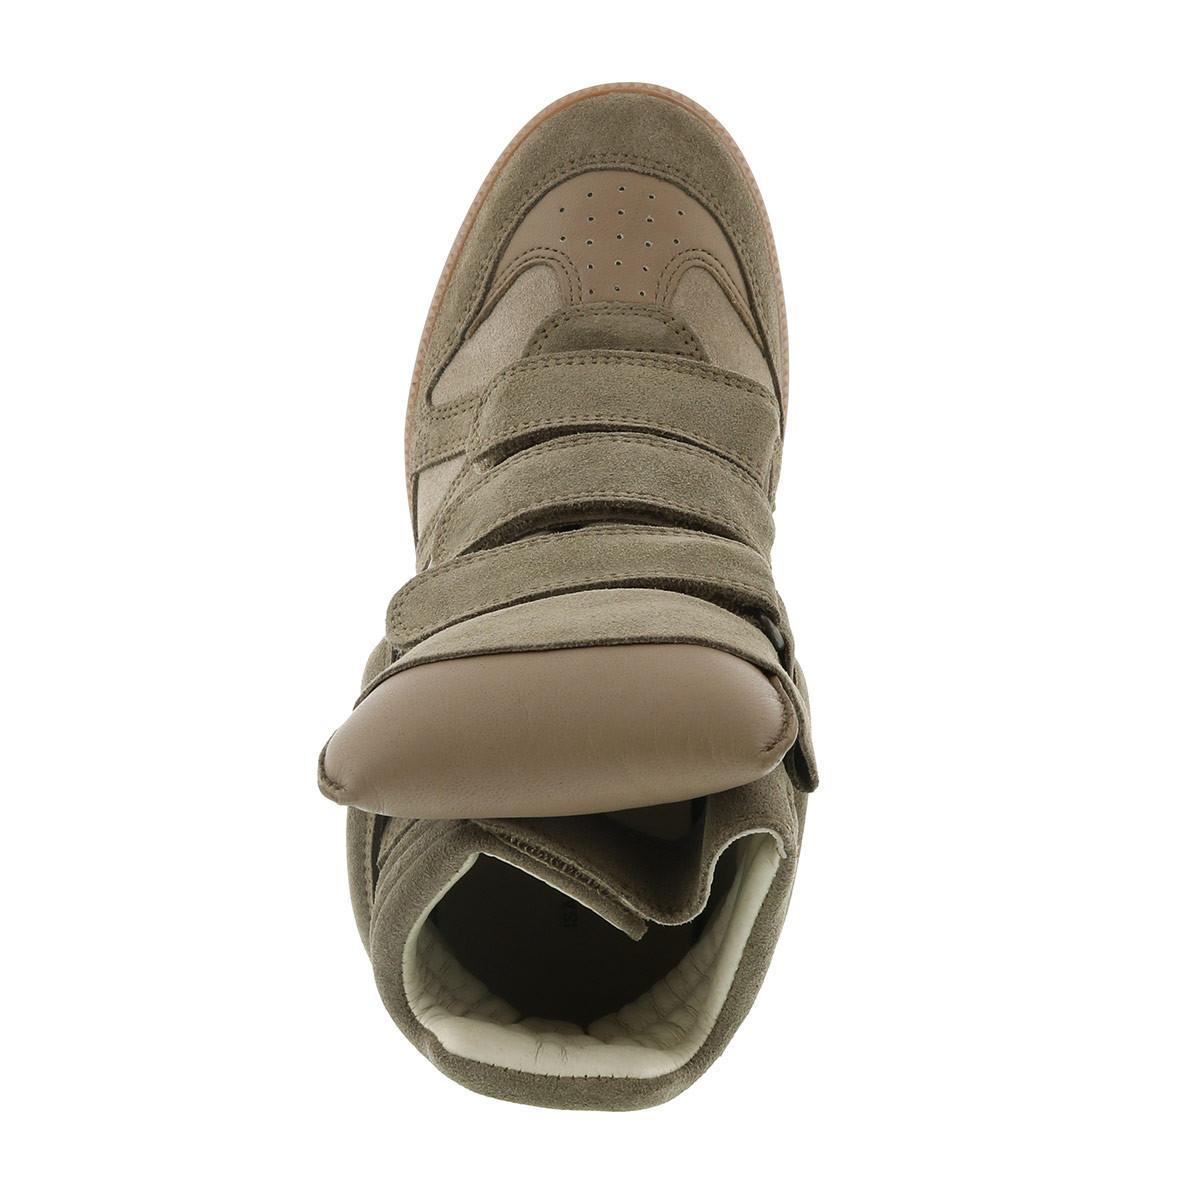 Isabel Marant Bekett Sneakers Suede Taupe in Green